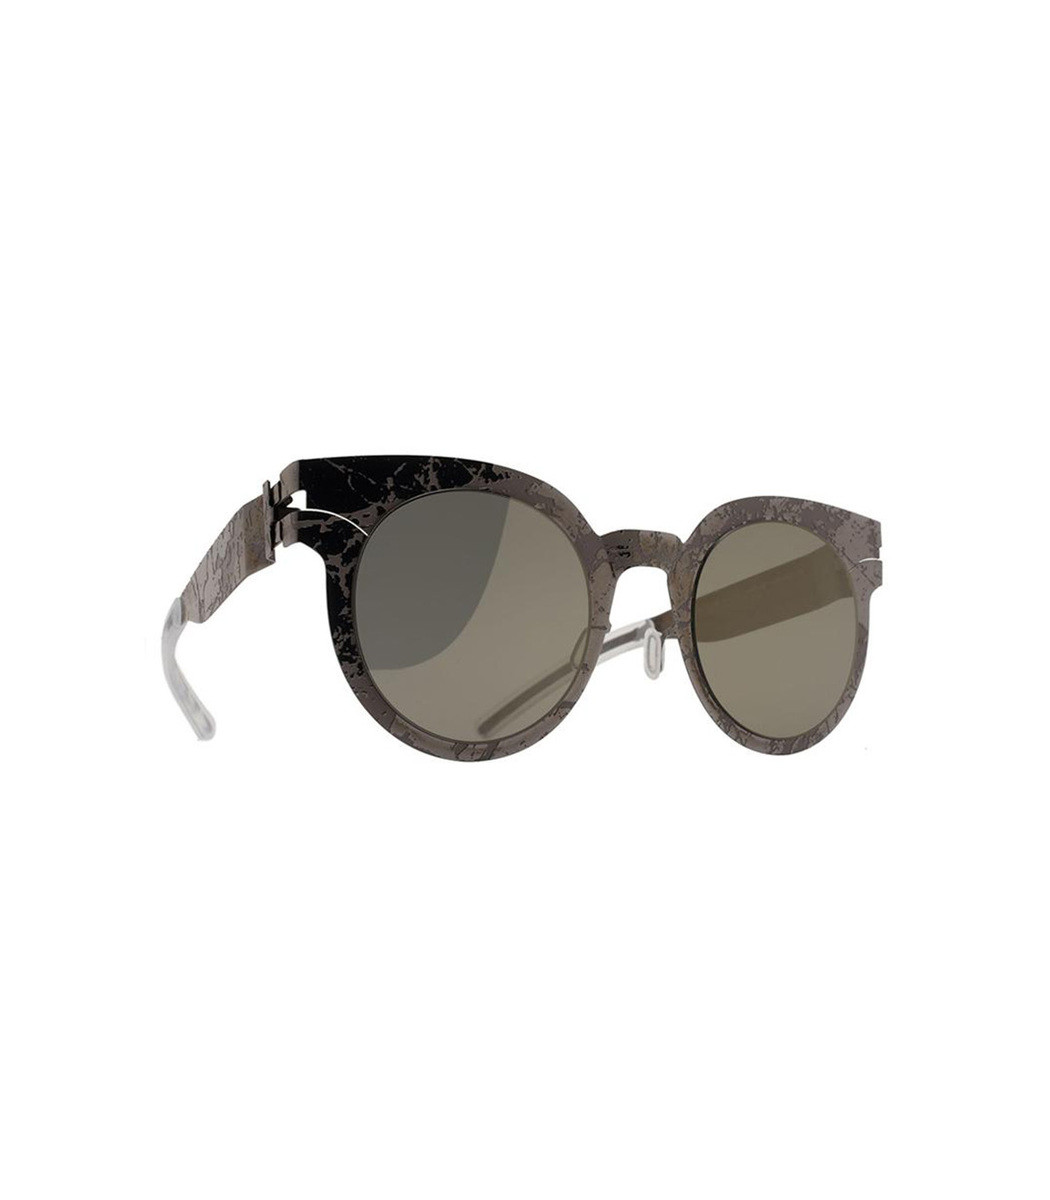 Mykita Black X Maison Margiela 'Transfer' Sunglasses